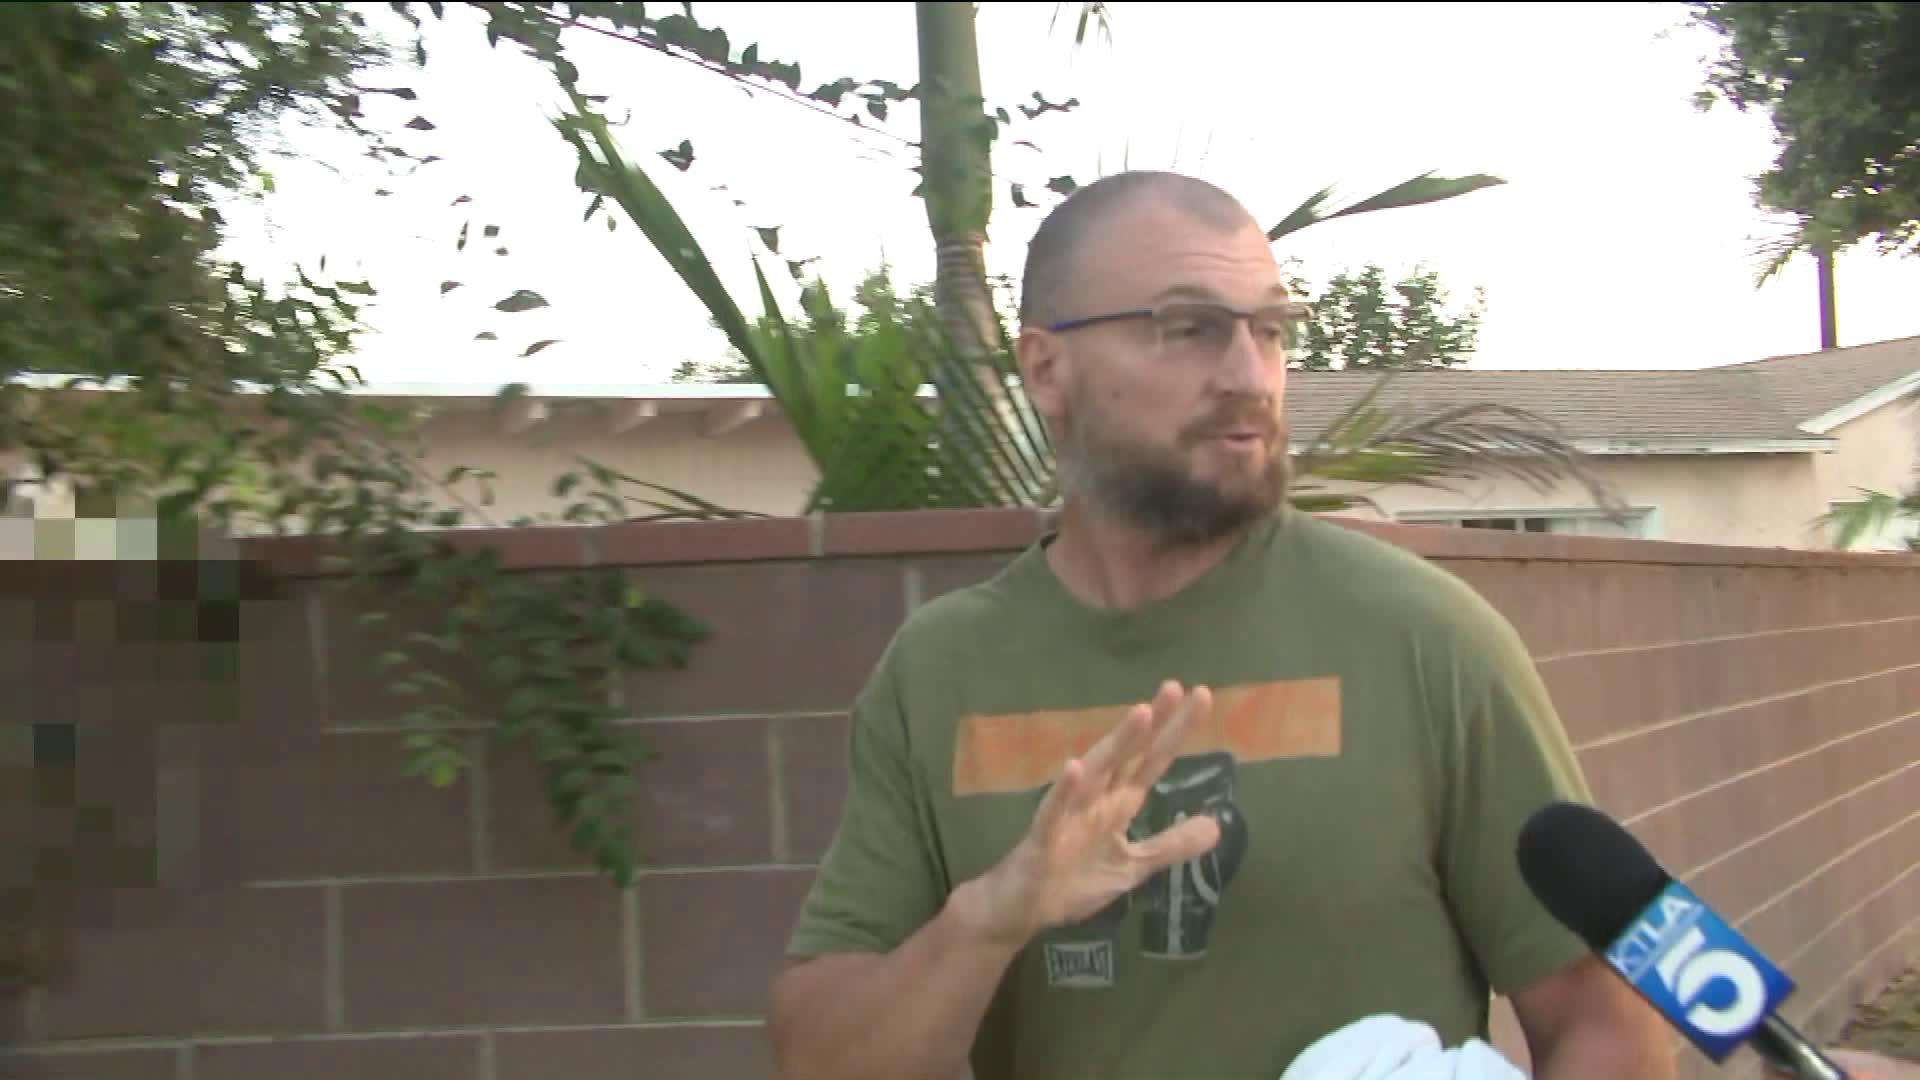 Bruce Beresford-Redman is seen outside his home on Sep. 9, 2019. (Credit: KTLA)